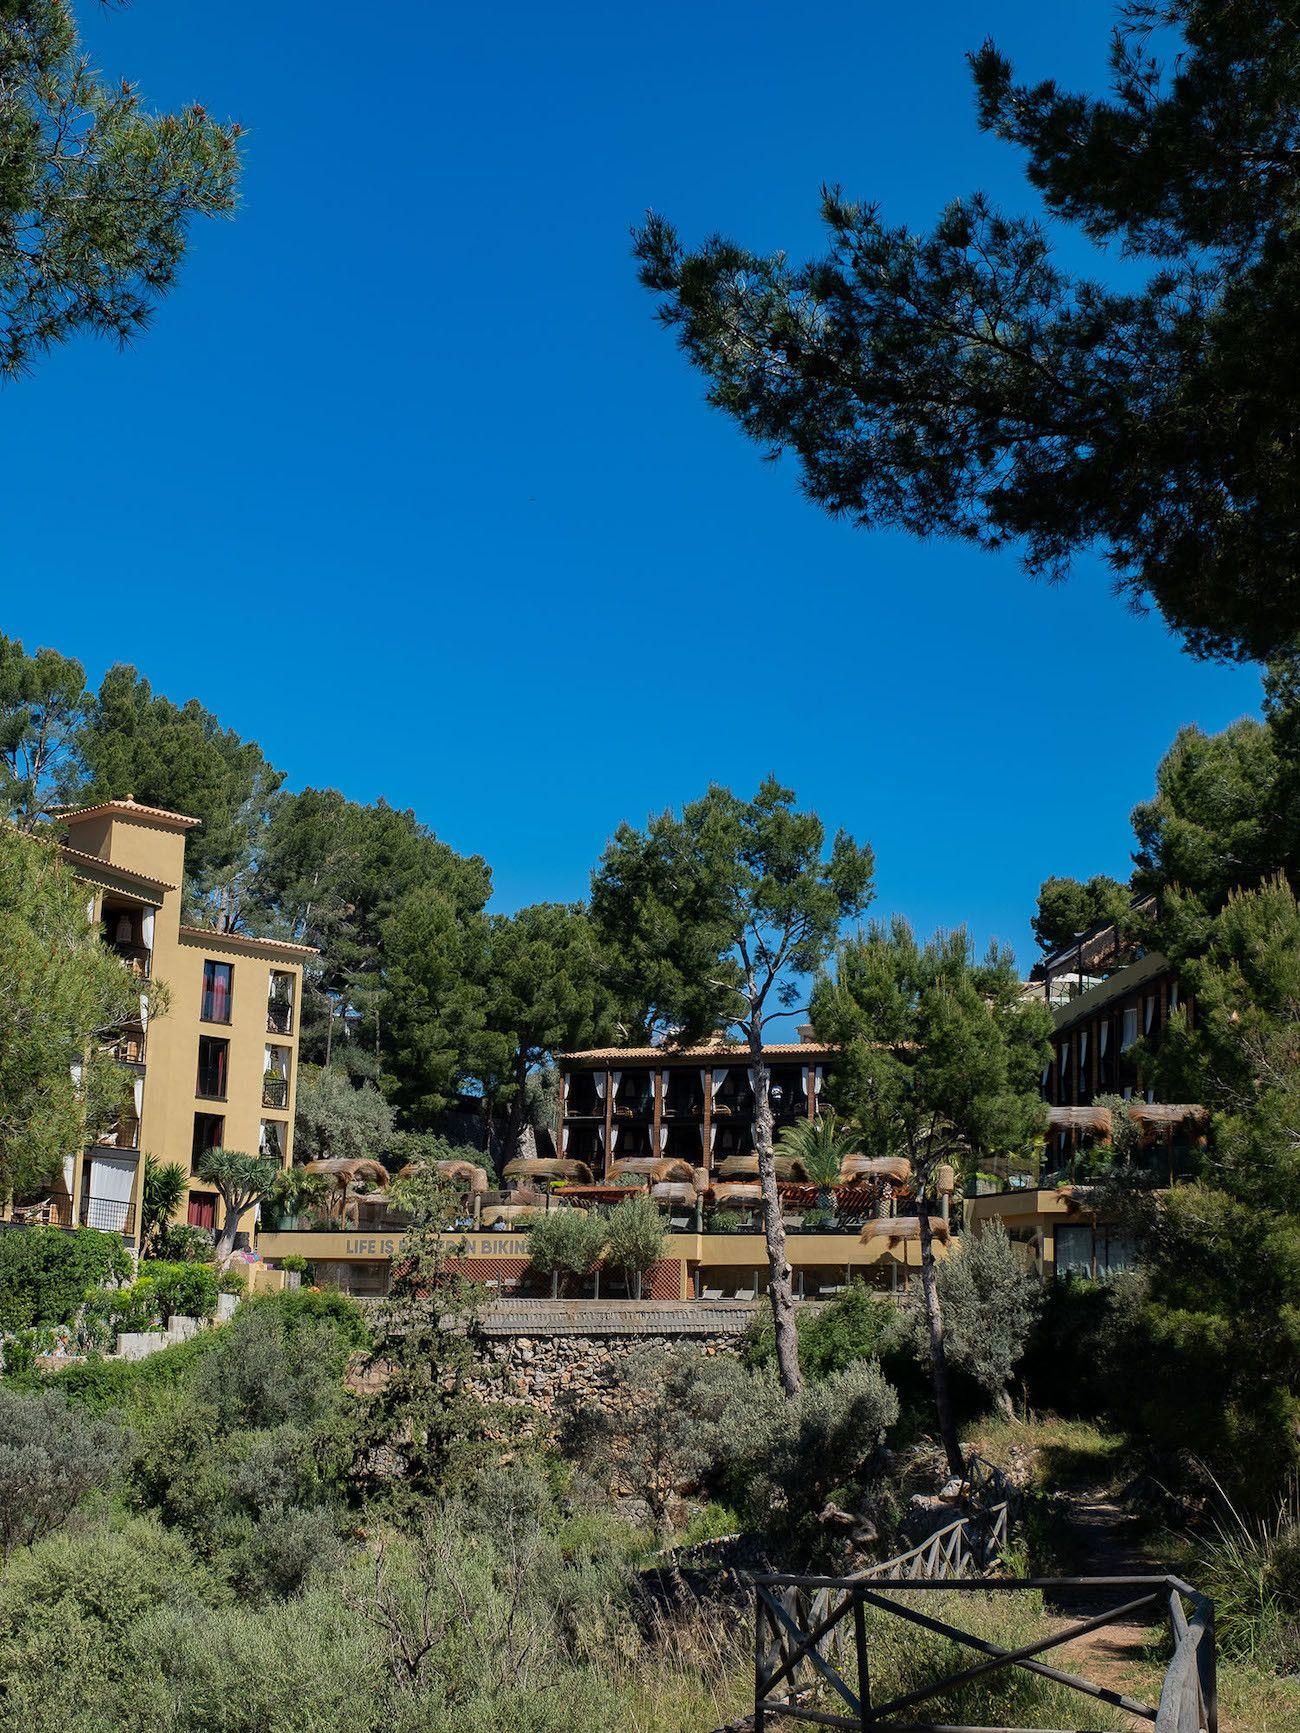 Foodblog About Fuel, Bikini Island & Mountain Hotels